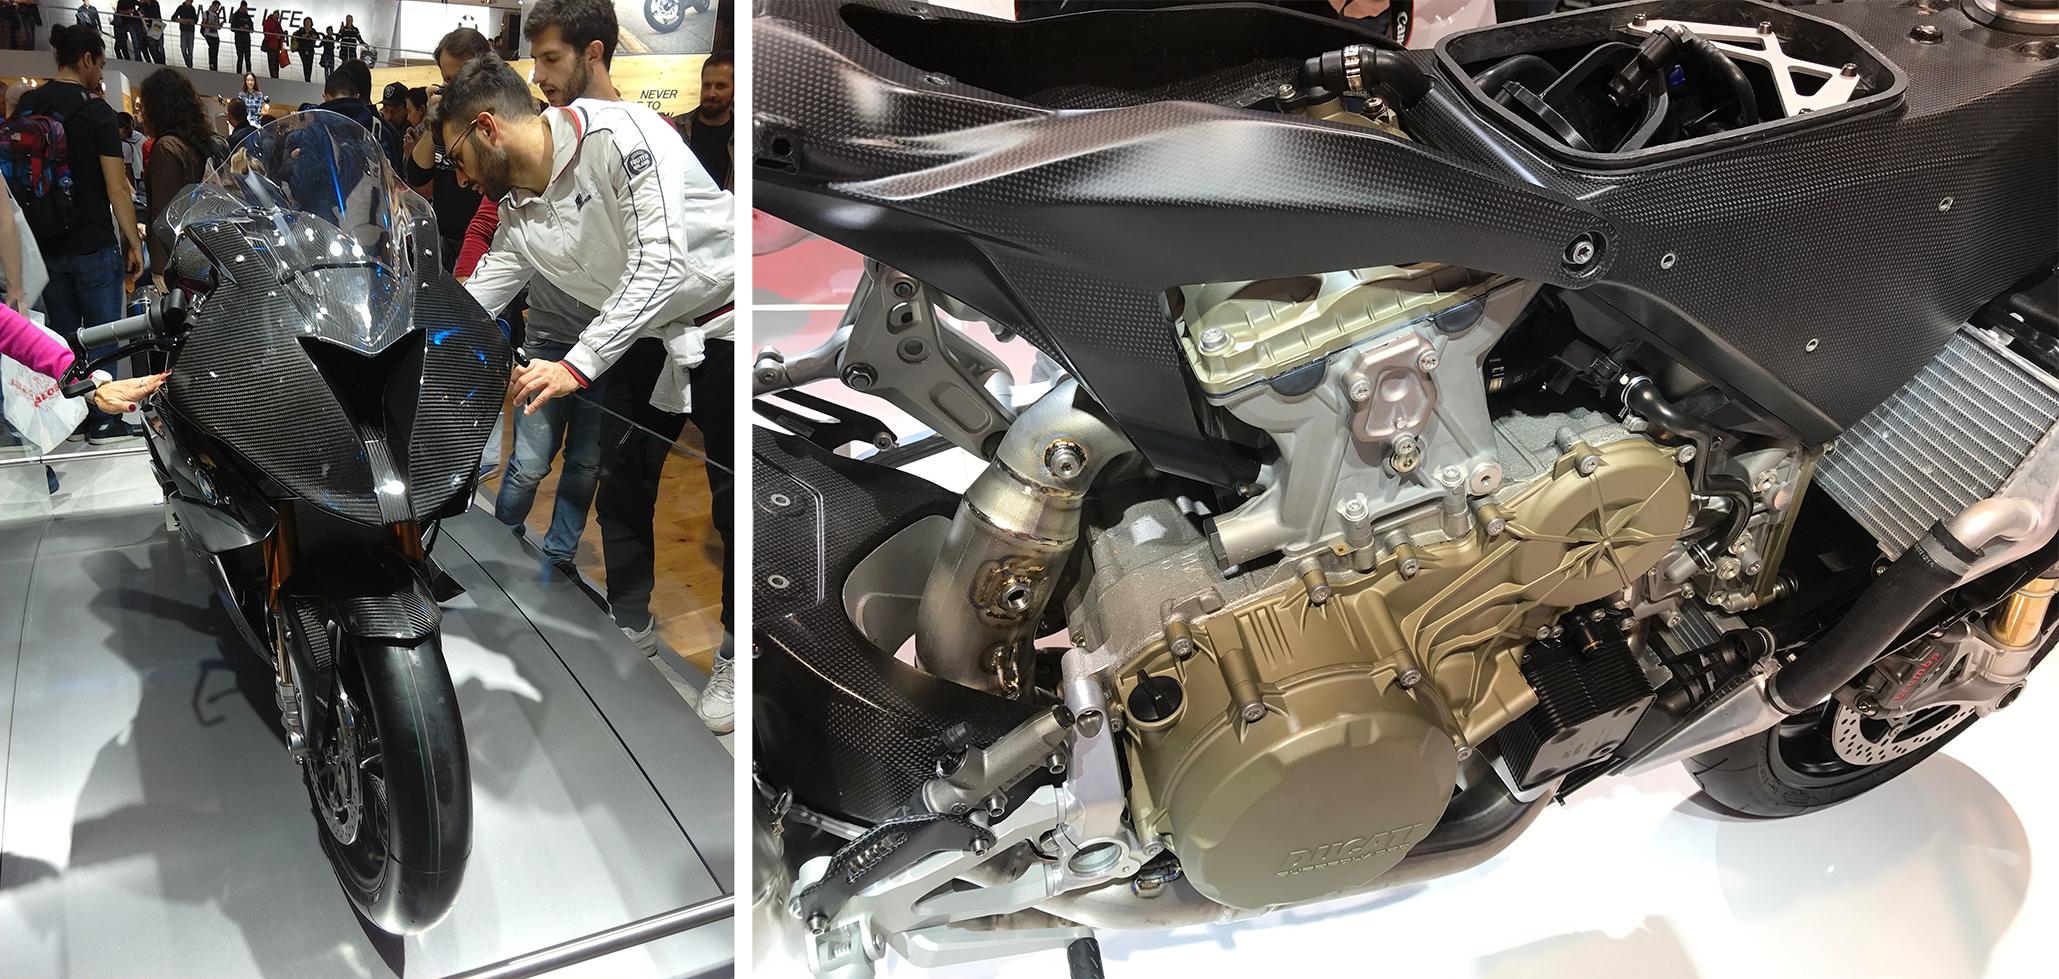 Left to right, BMW HP4 Race, Ducati 1299 Superleggera.